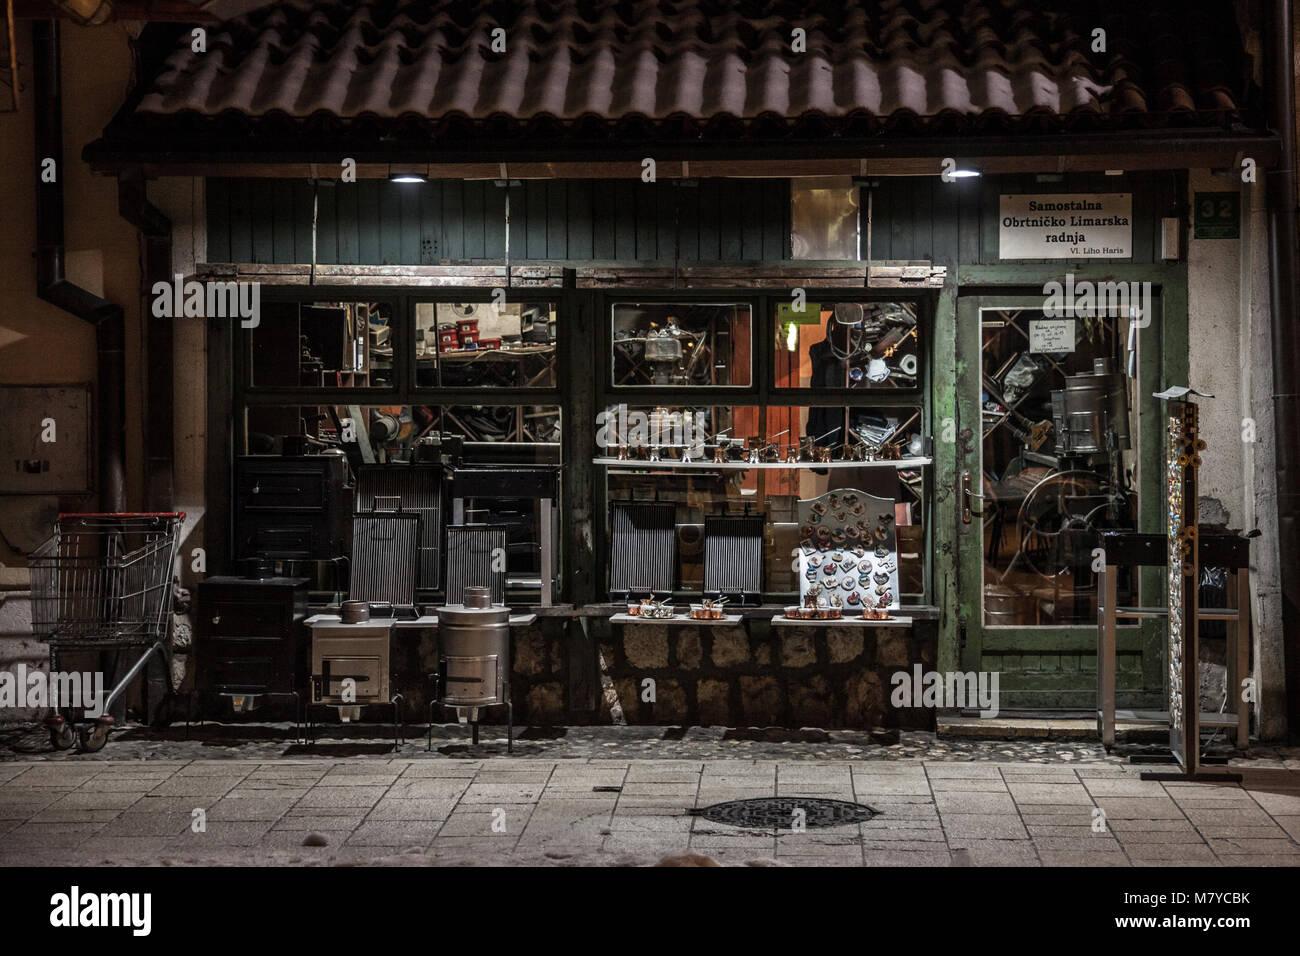 SARAJEVO, BOSNIA AND HERZEGOVINA - FEBRUARY 16, 2018: Shop in a street of the Bascarsija district of Sarajevo, with - Stock Image